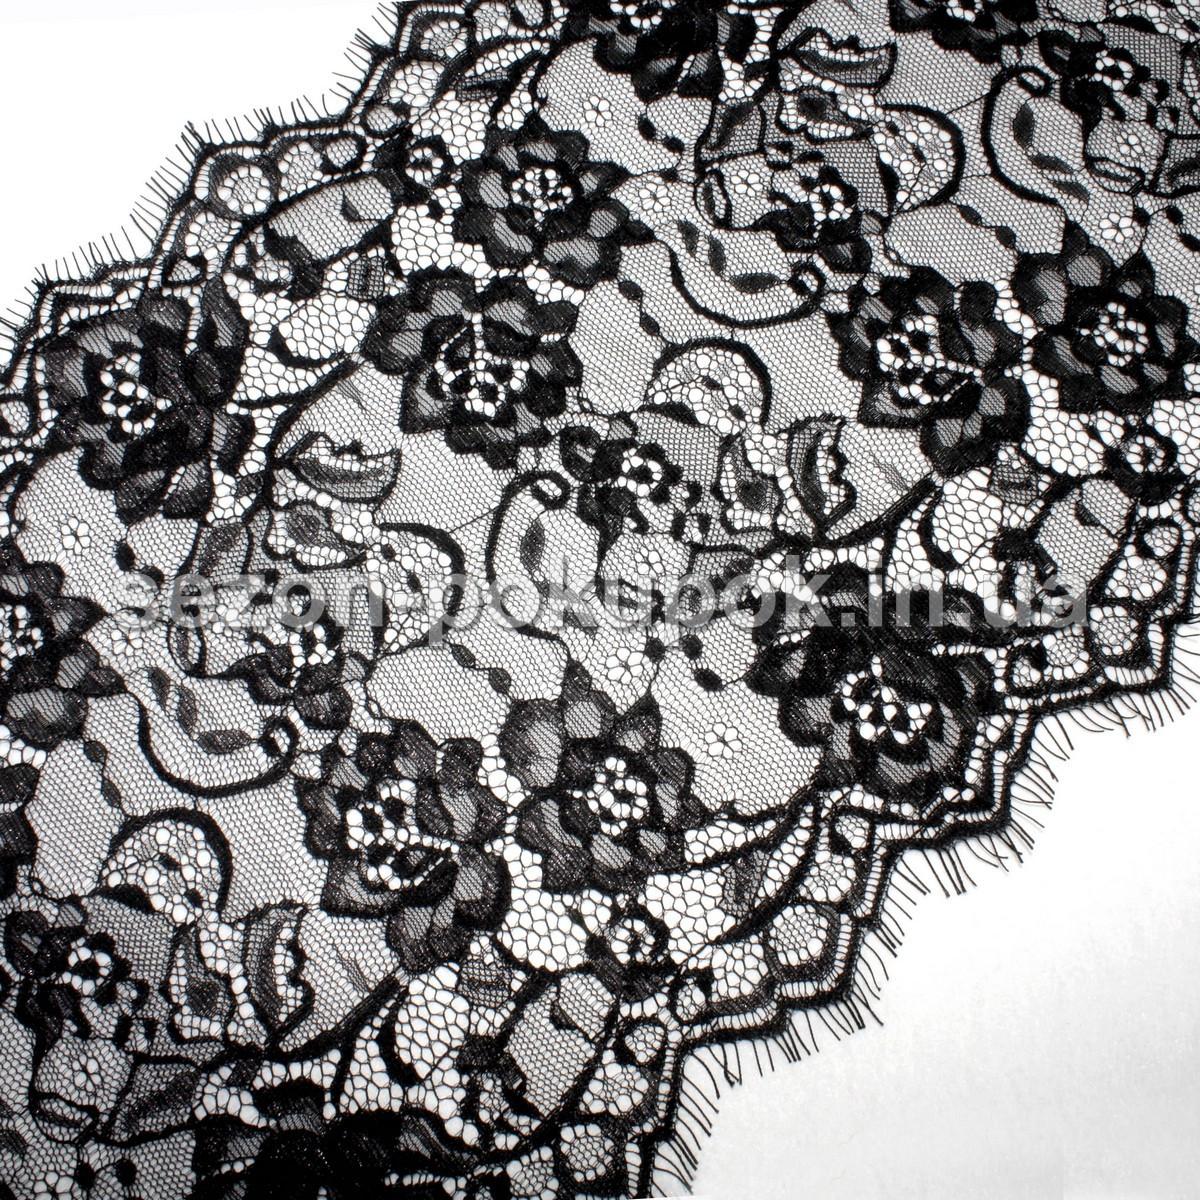 (цена за 3 метра) Французское кружево (Шантильи, с ресничками) ширина 24см Цвет - черный